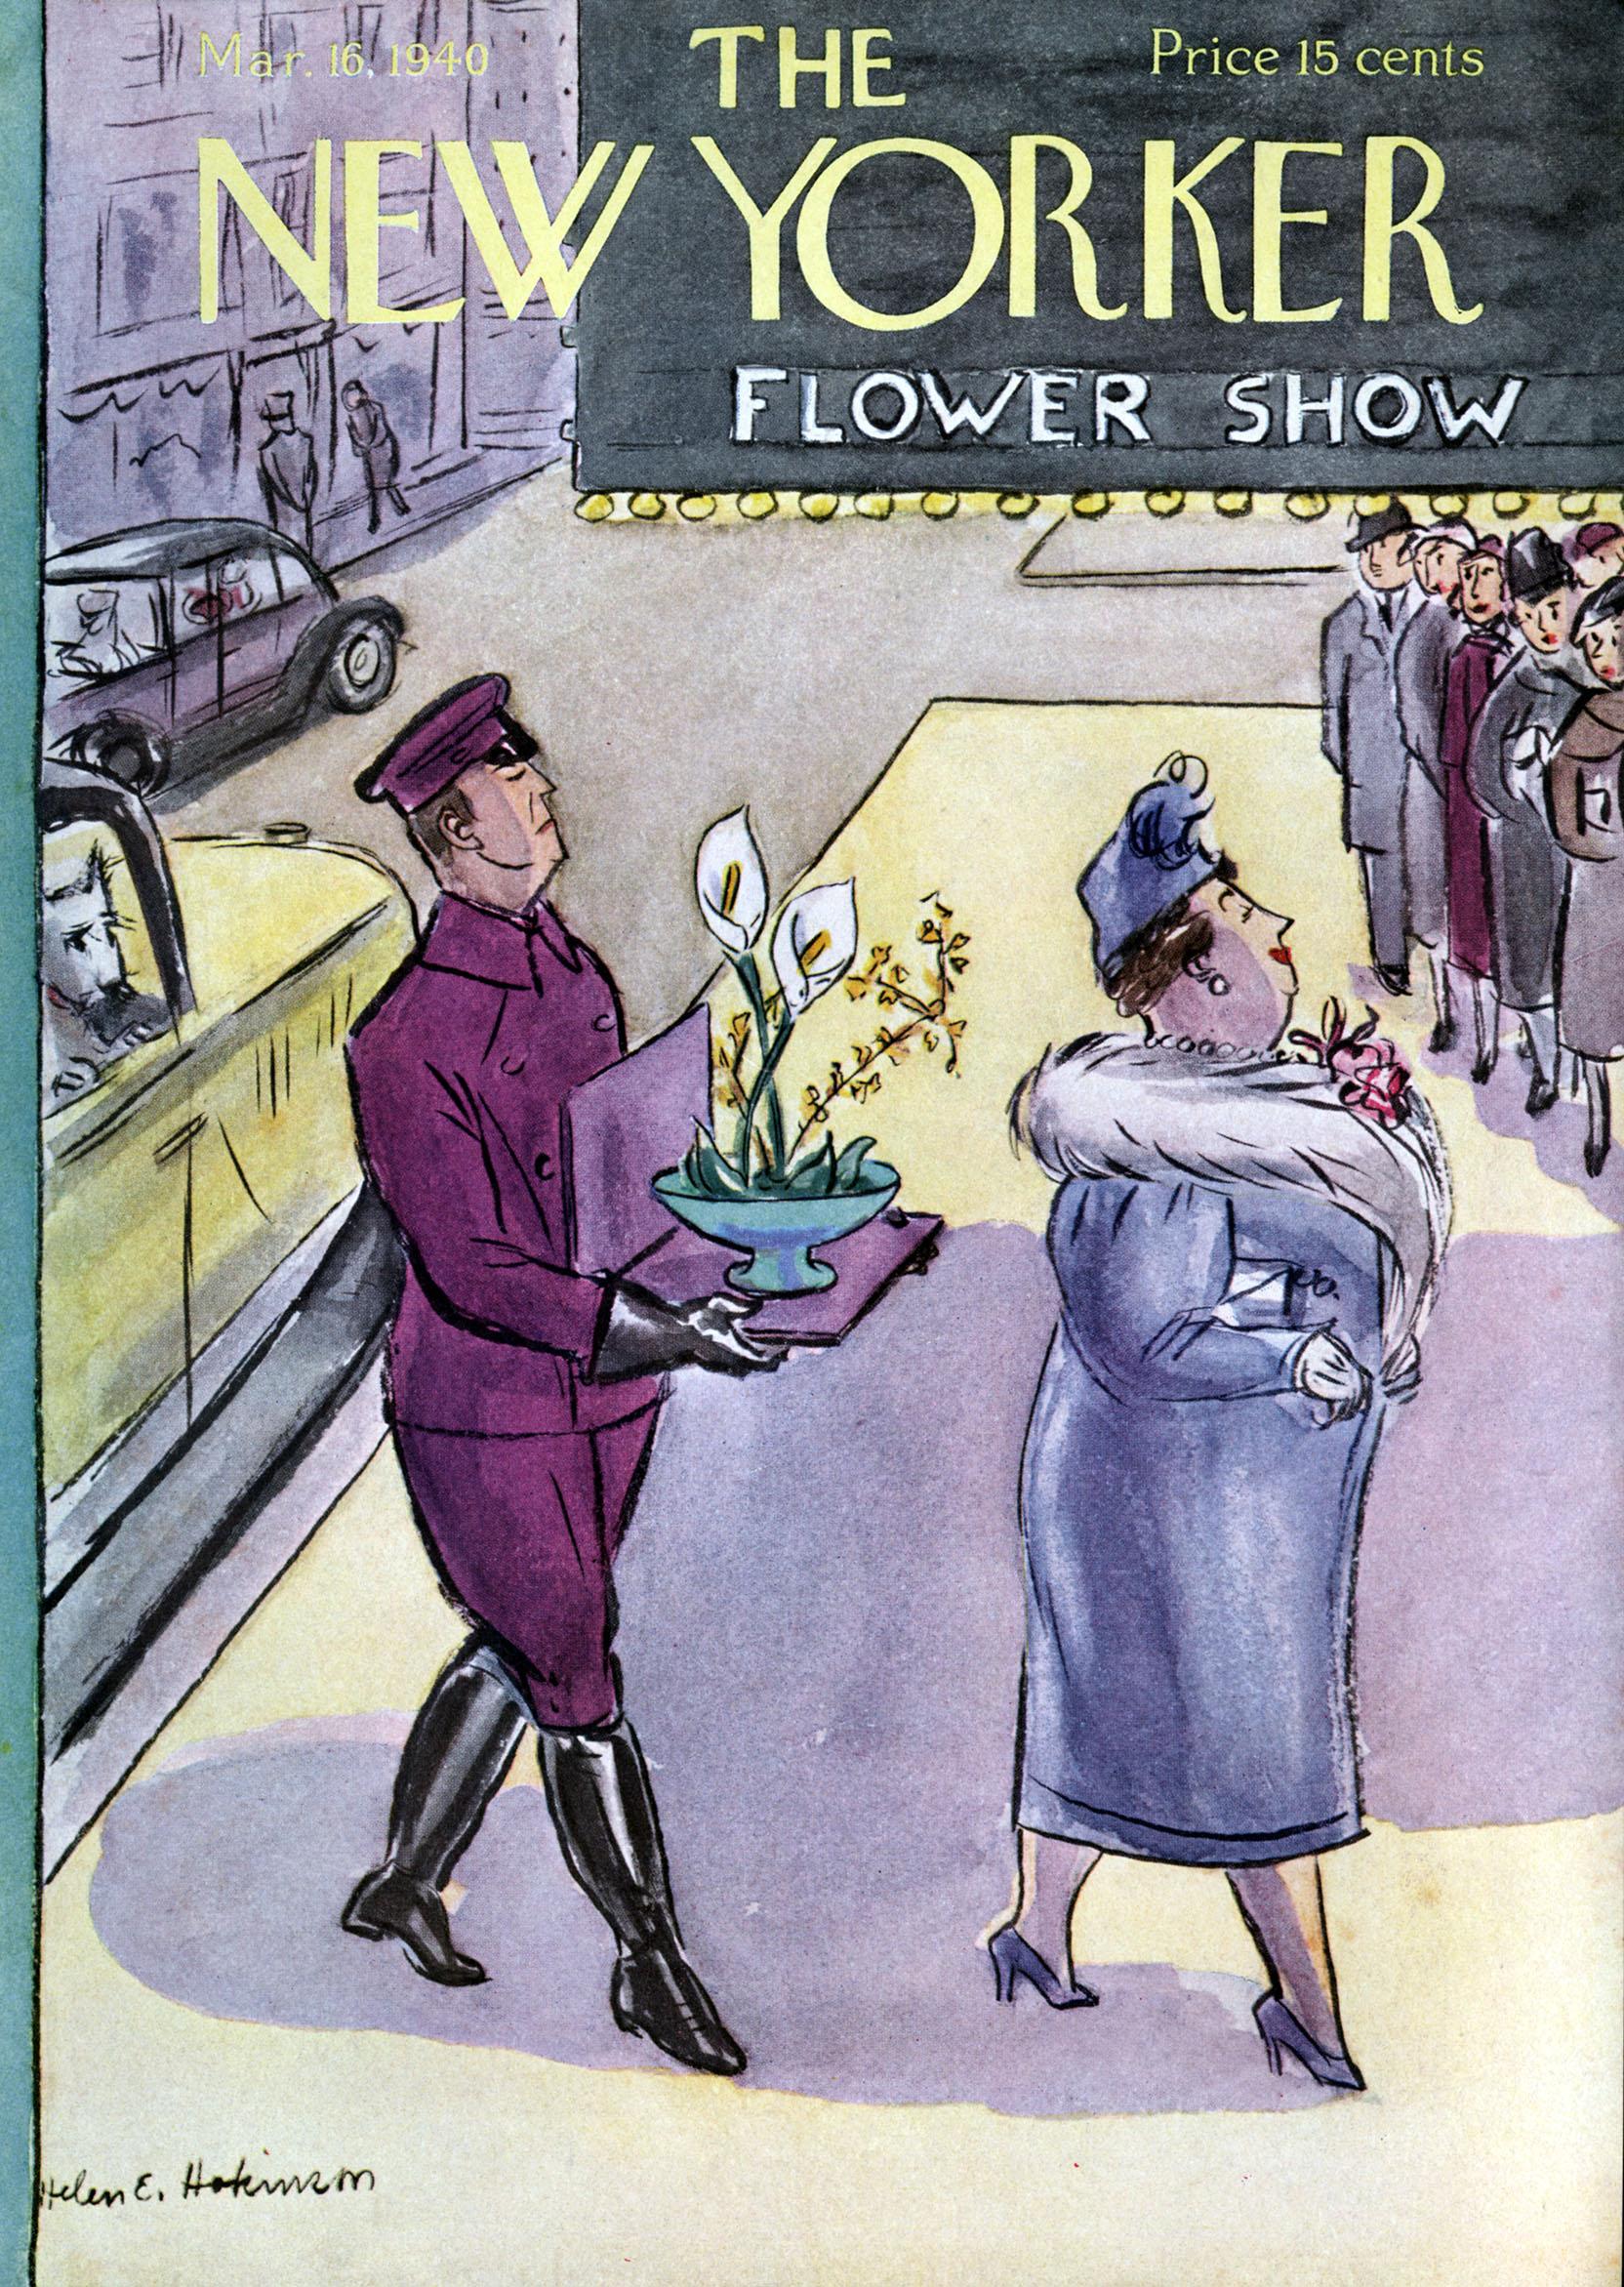 Helen E. Hokinson, Cover Illustration for The New Yorker. March 16, 1940.